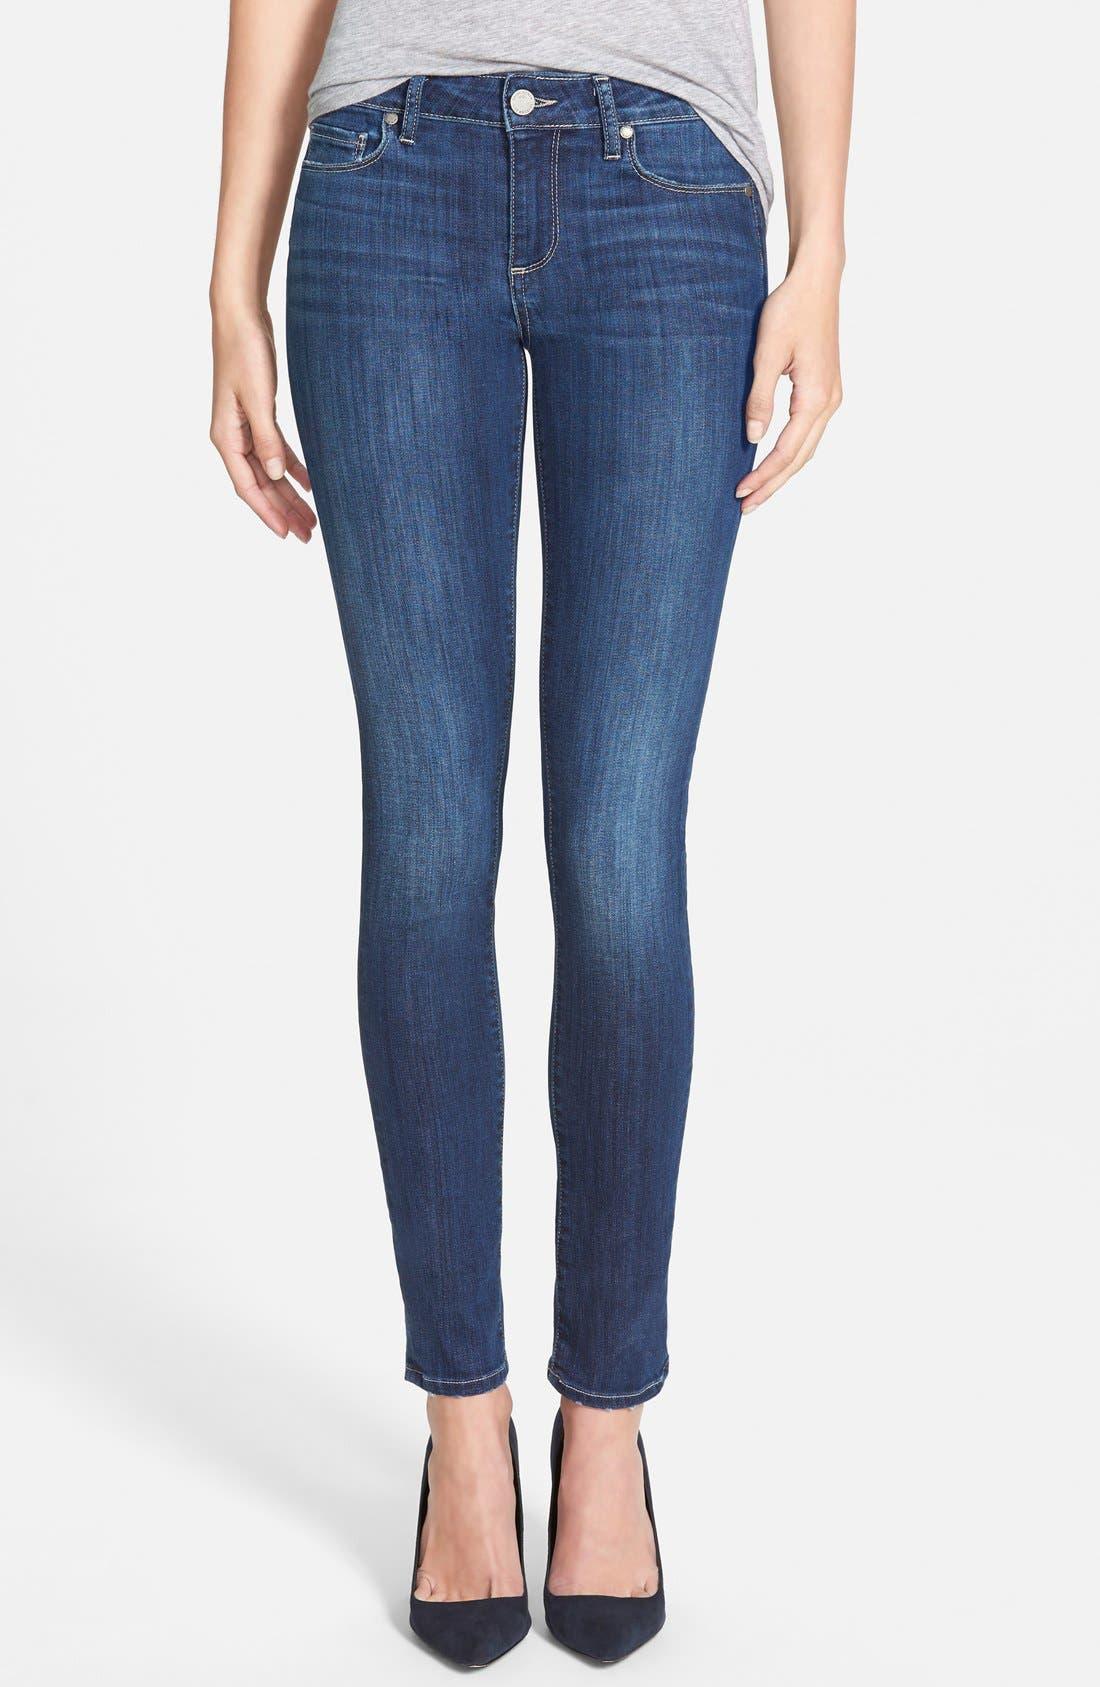 Main Image - Paige Denim 'Skyline' Skinny Jeans (Raya) (Nordstrom Exclusive)